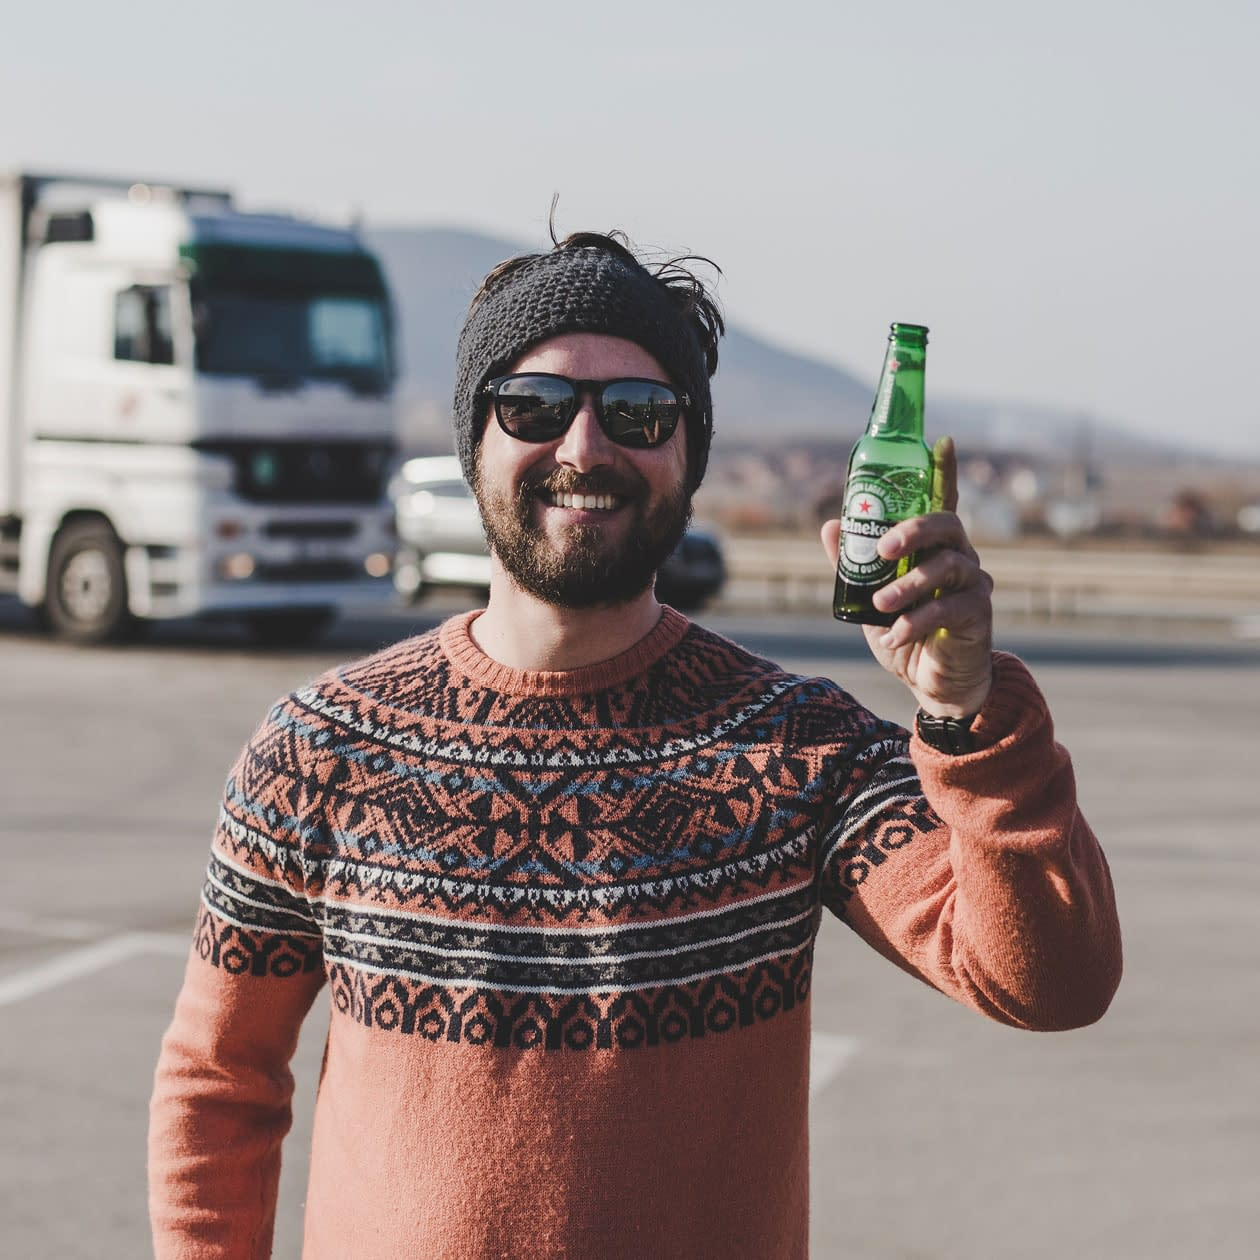 Snowmads Travel Balkan Winter Experience Quide Dani